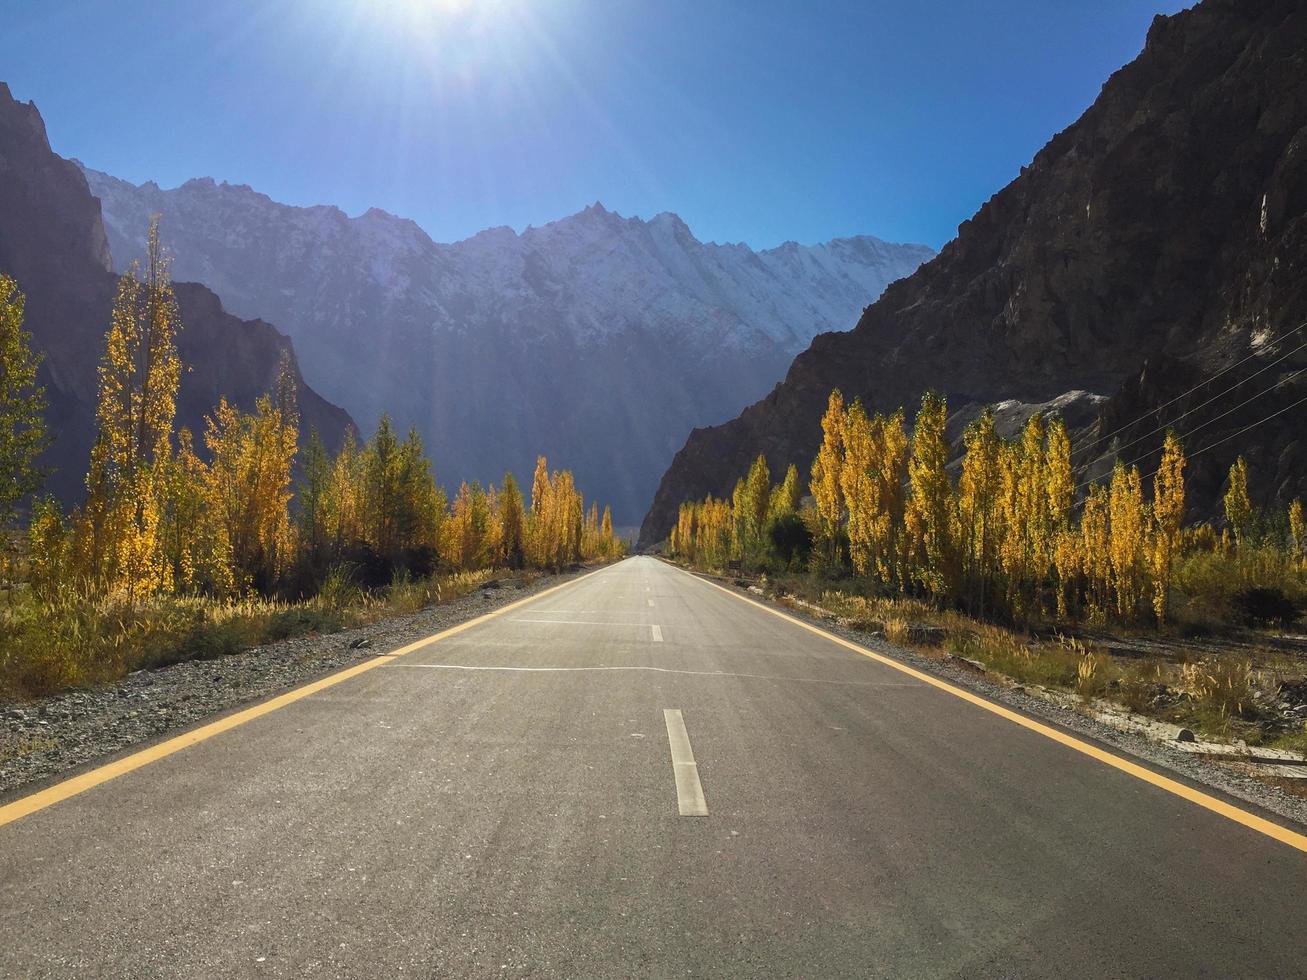 vista di autunno dell'autostrada karakoram foto